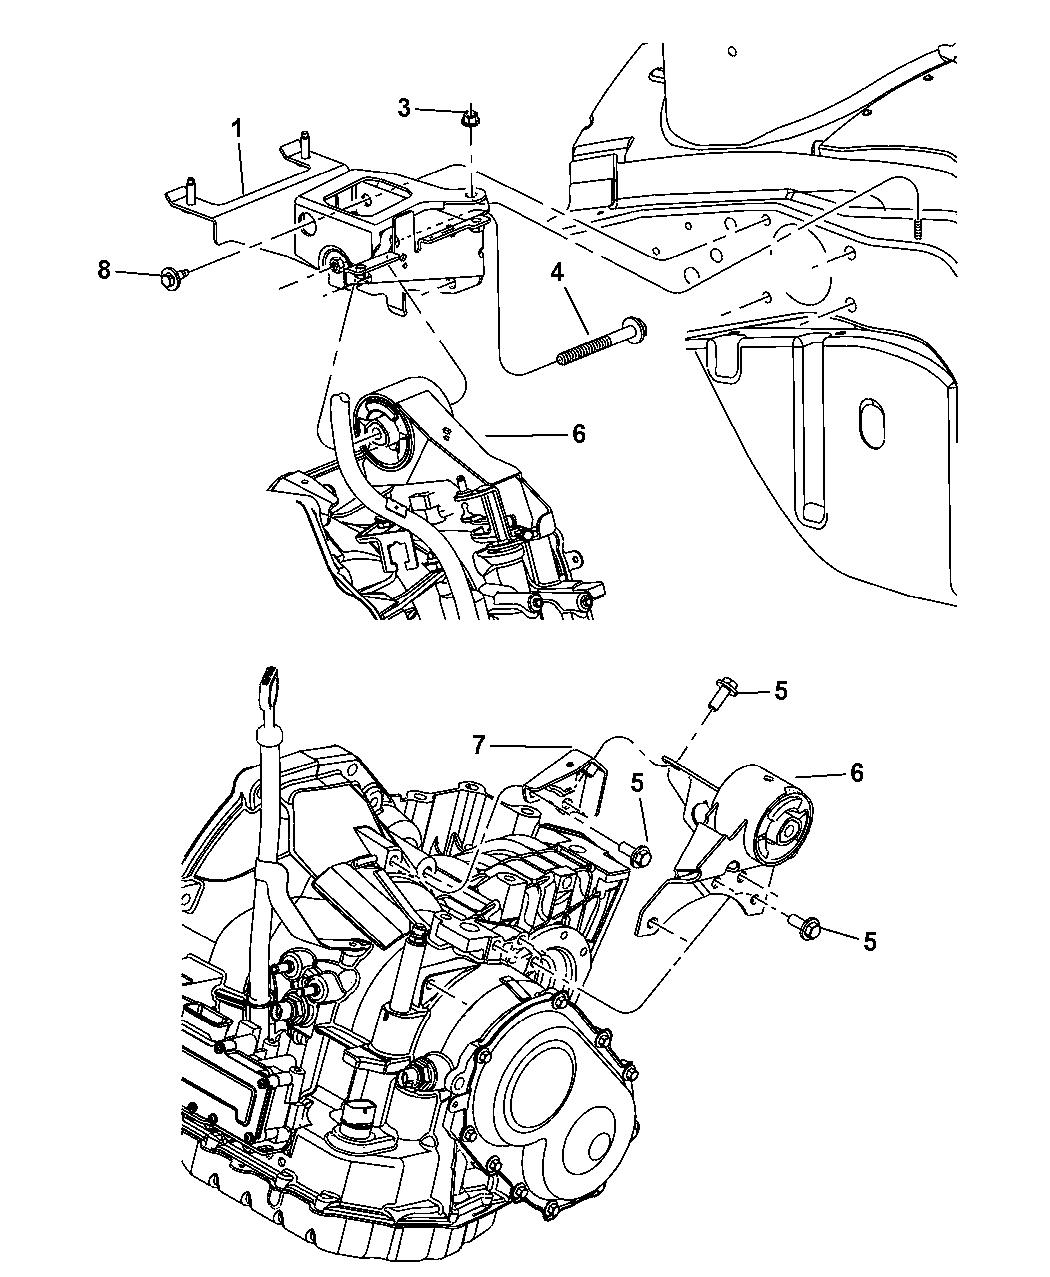 illustration(1 of 1): engine mounting transmission  2000 dodge neon  transmission